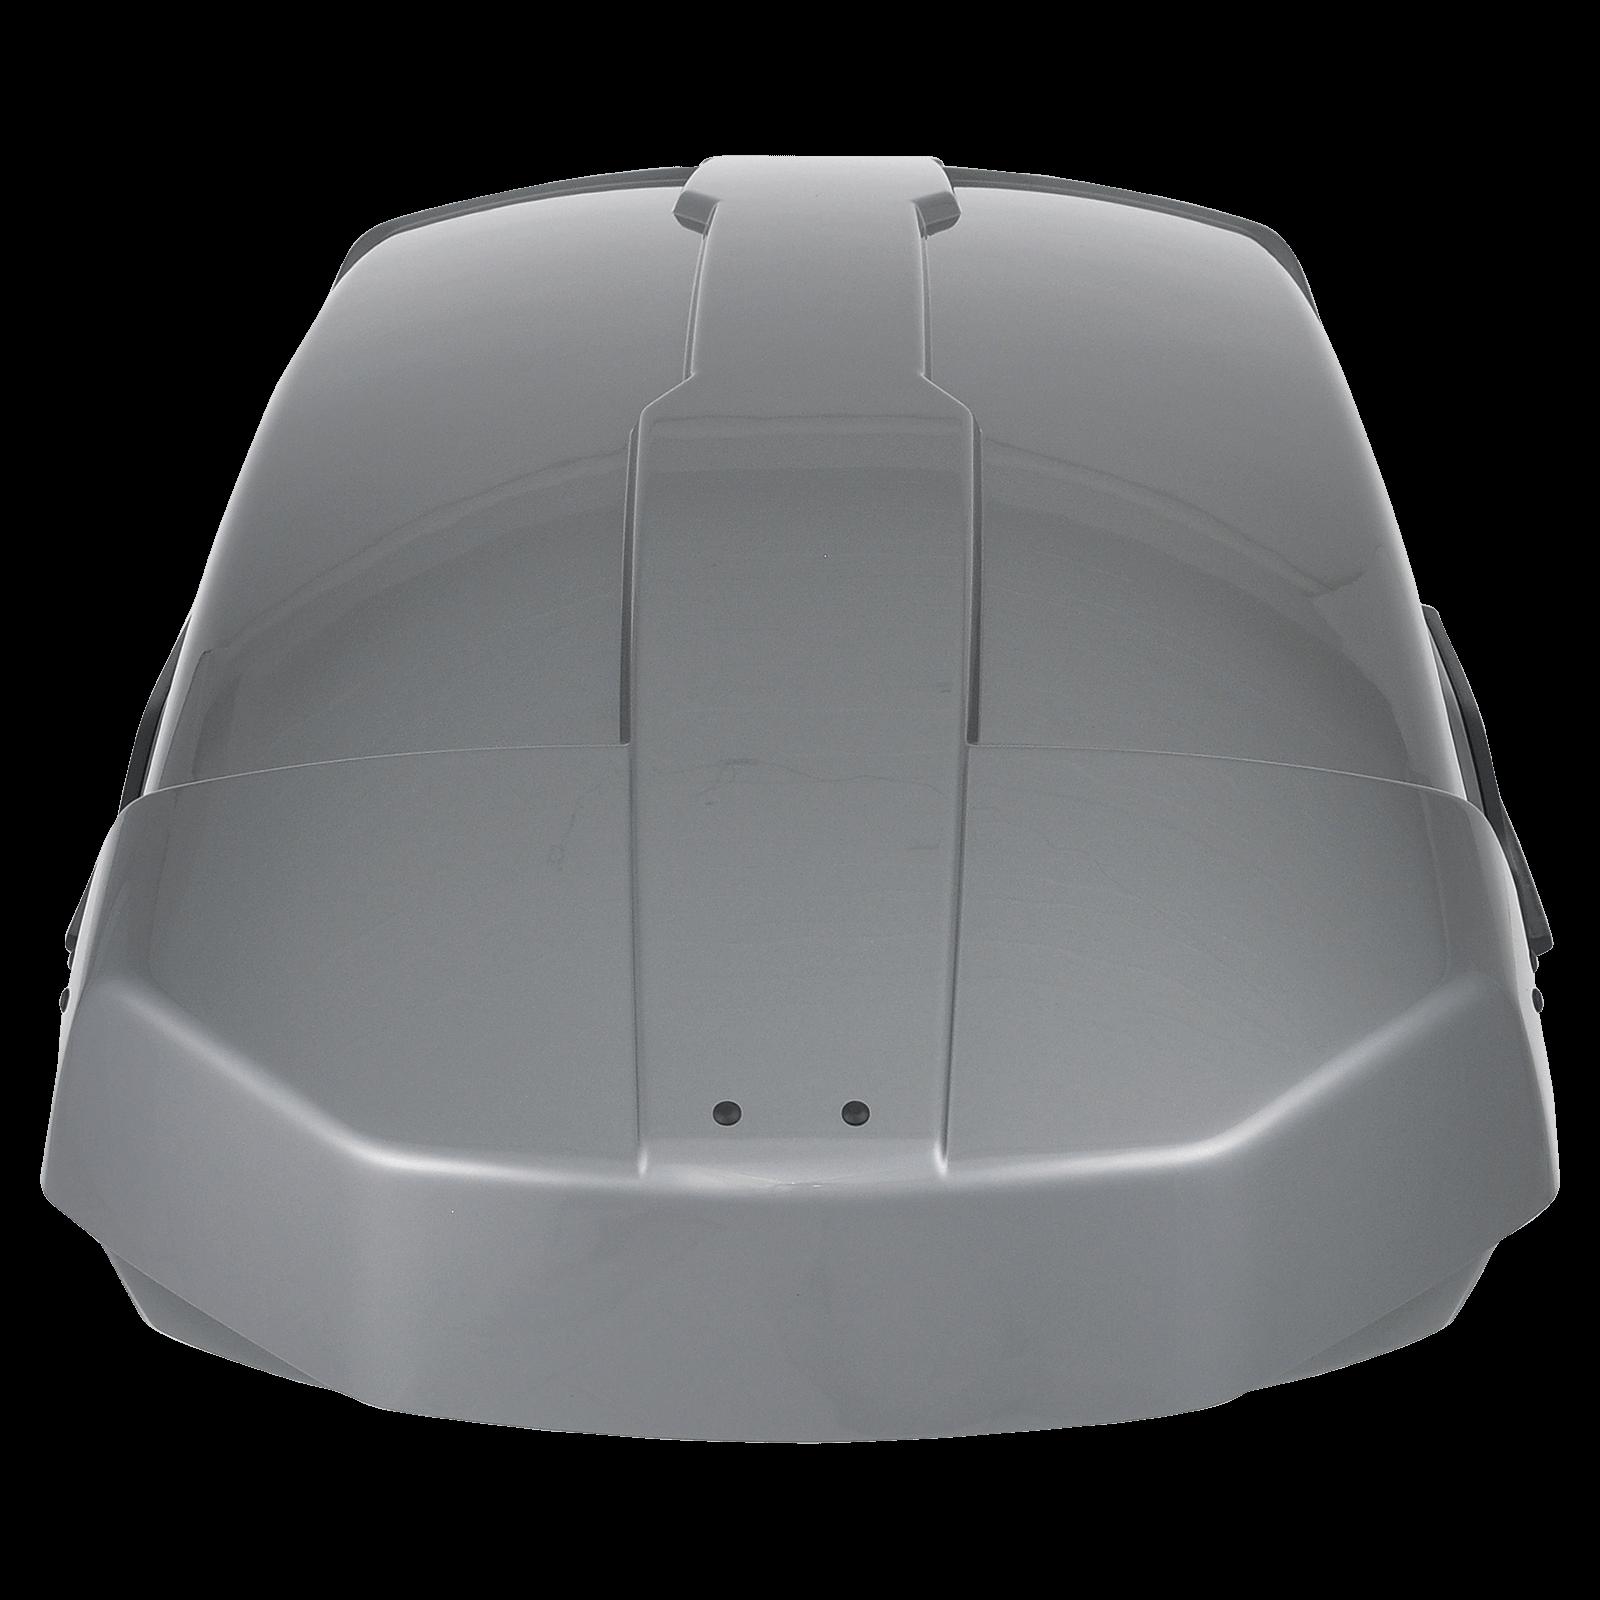 Dachbox Thule Motion XT M Titan Glossy - Bild 3